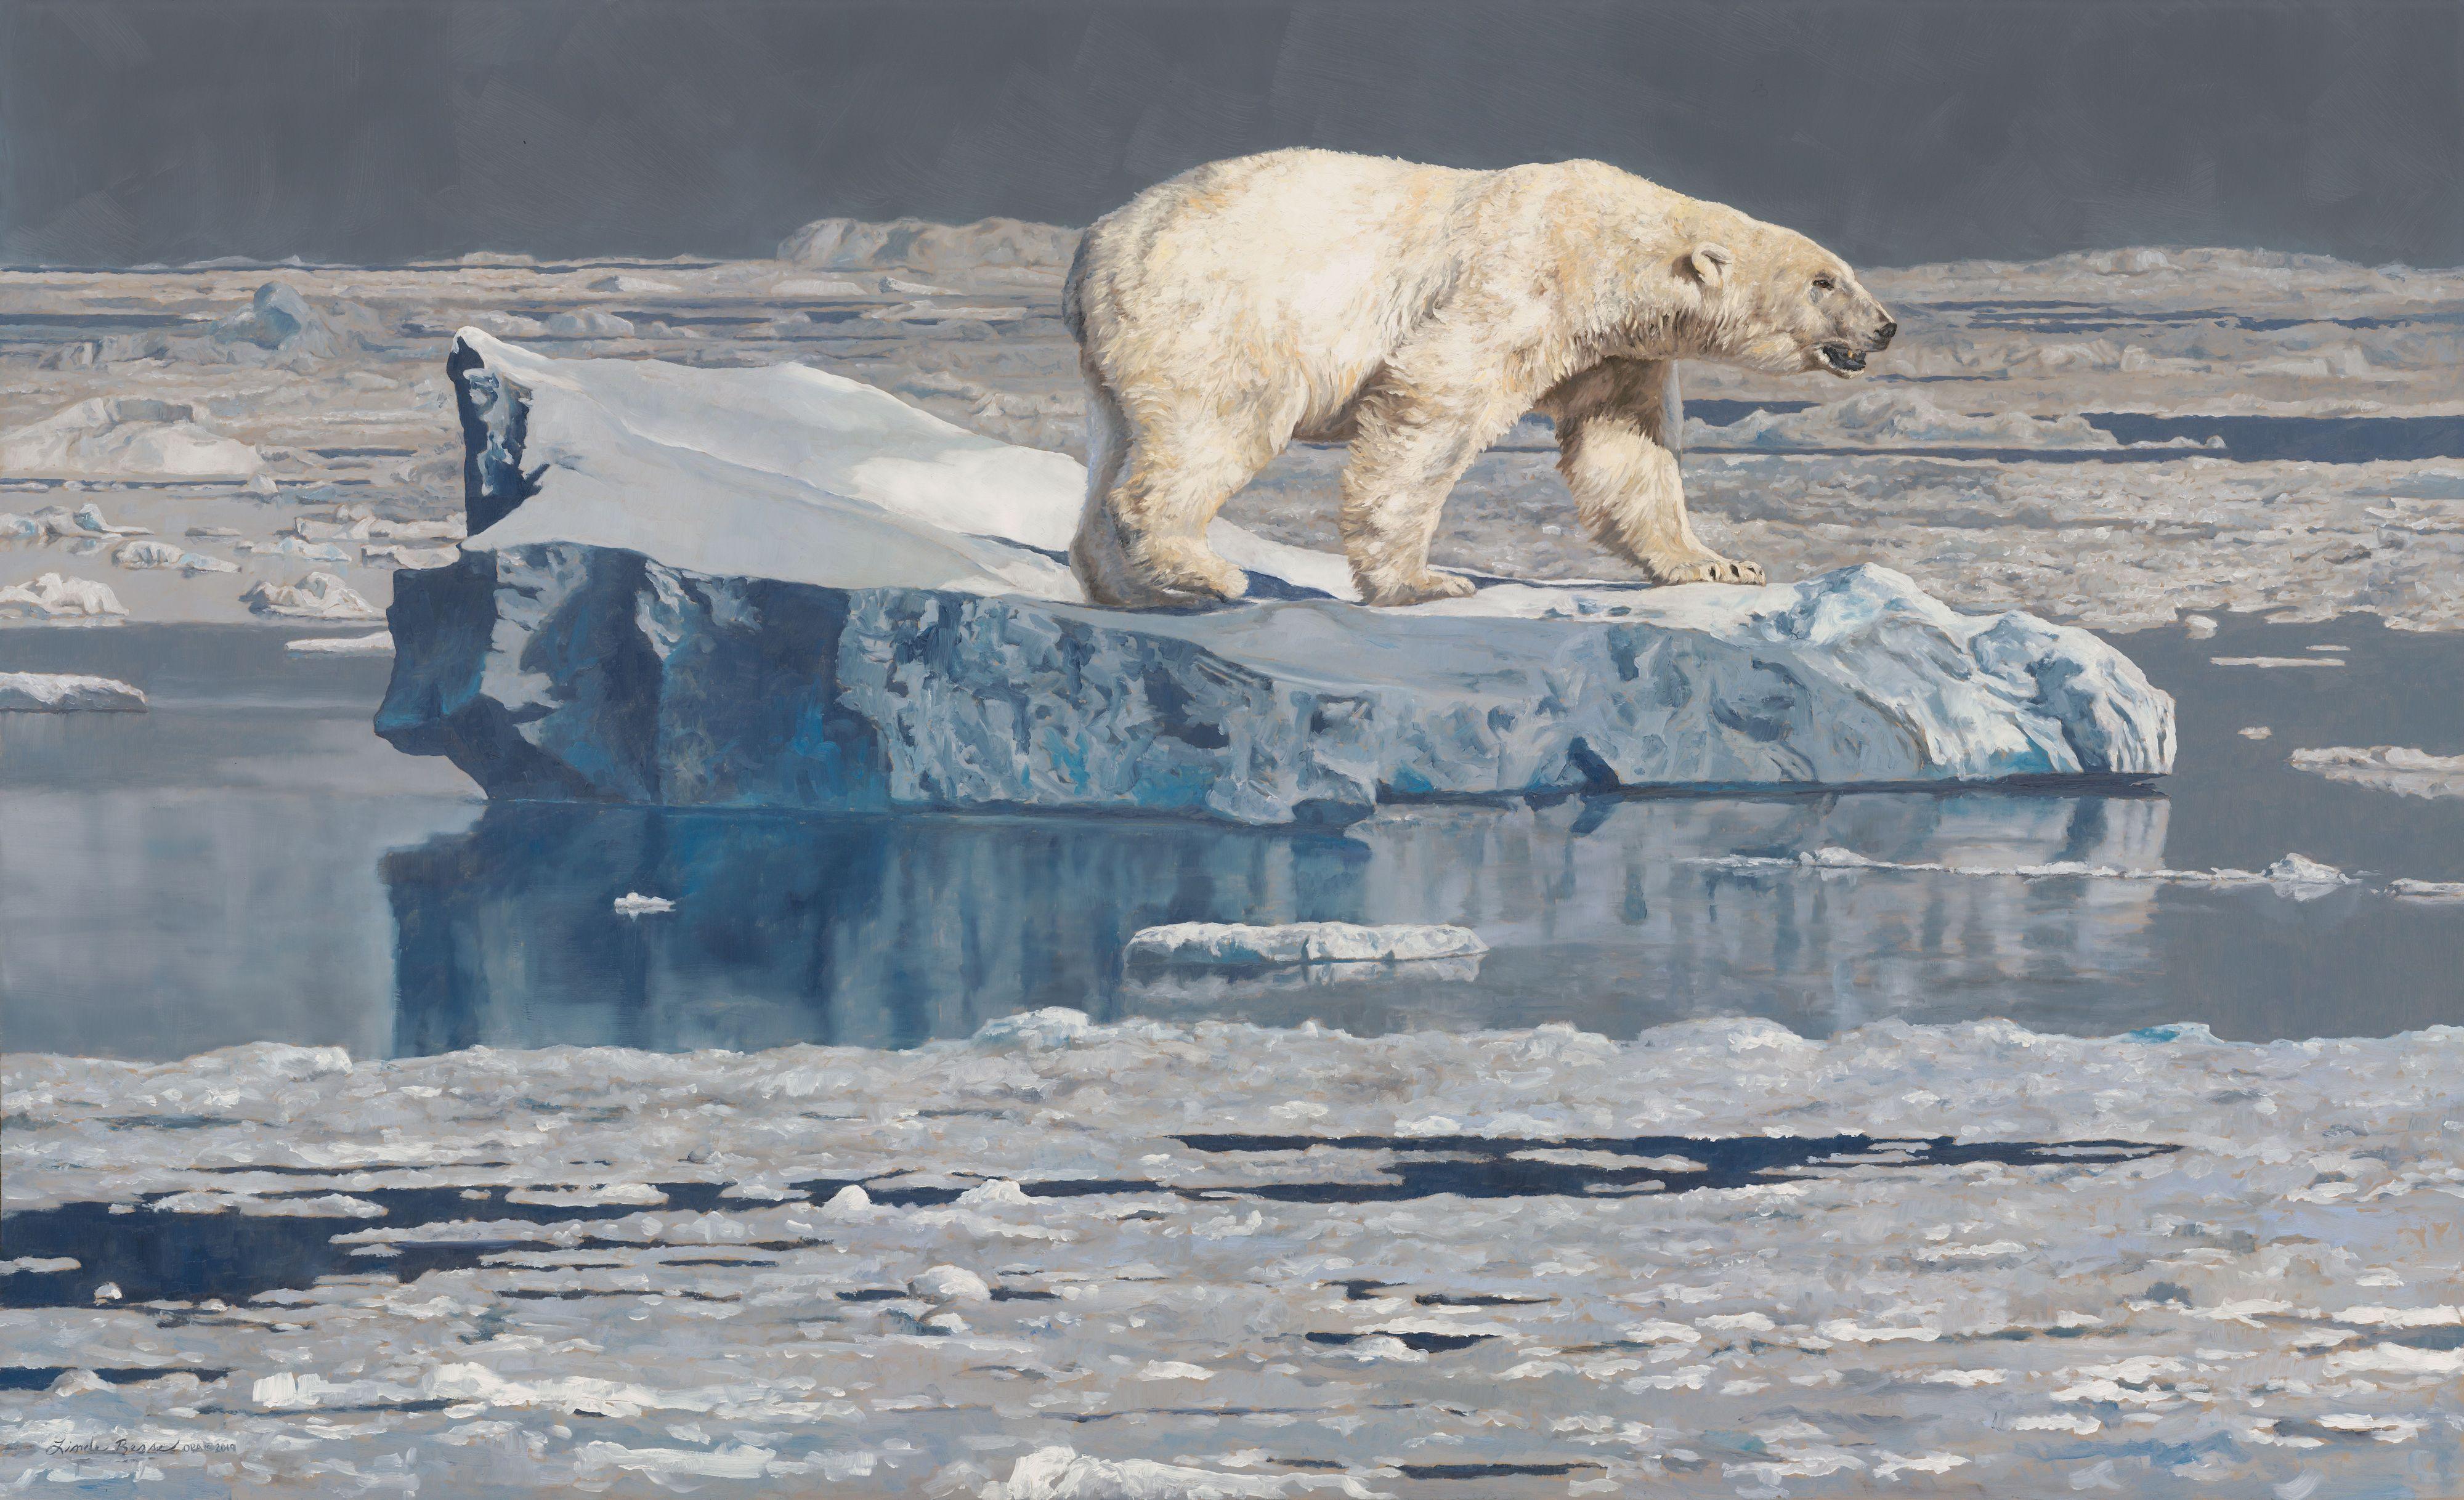 NOAPS Besse Ice Bear